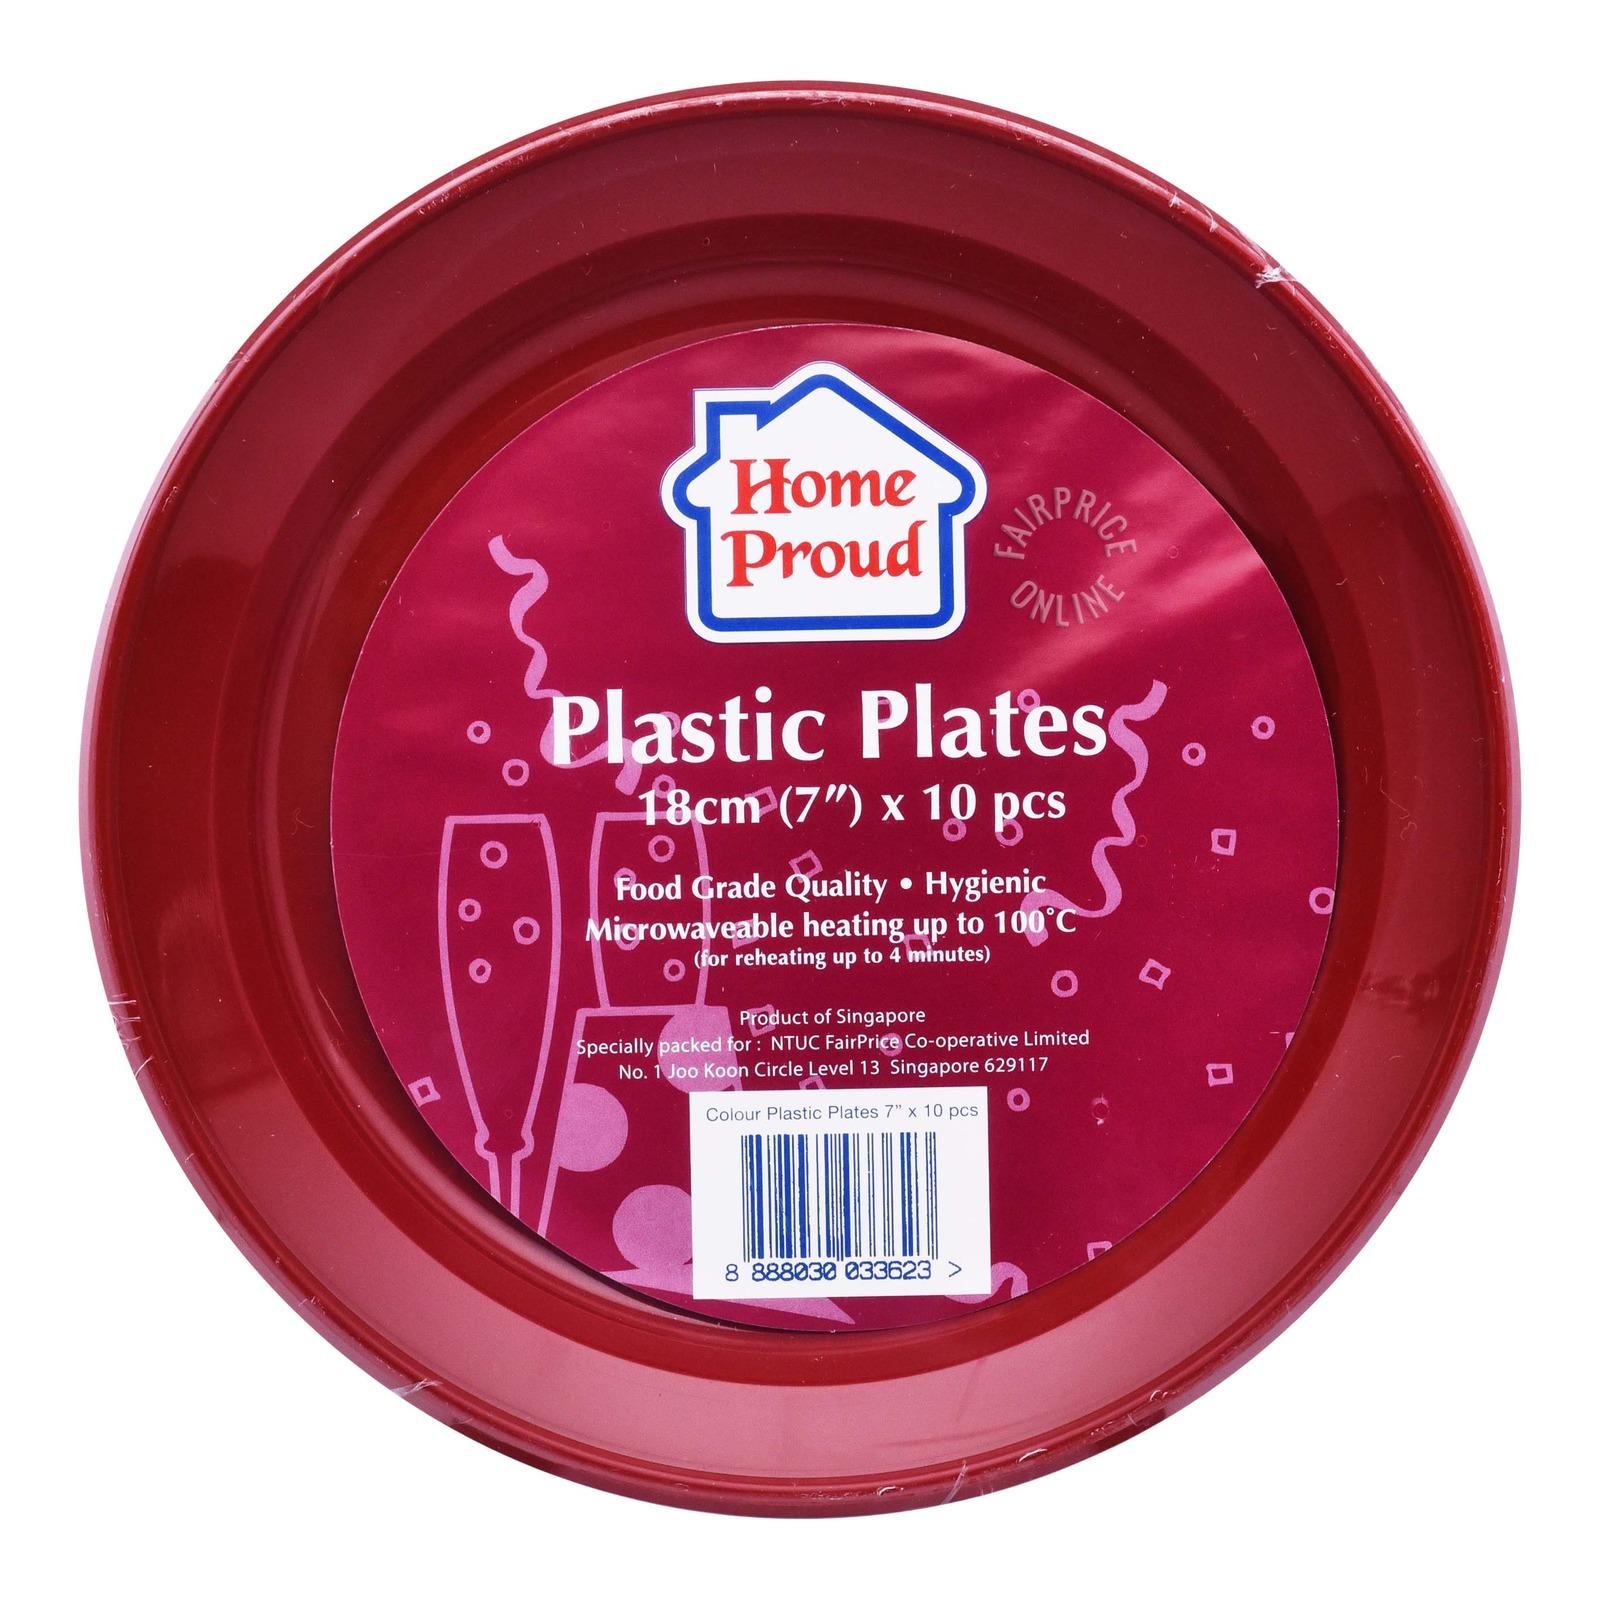 HomeProud Plastic Plates - Assorted Colour (18cm)